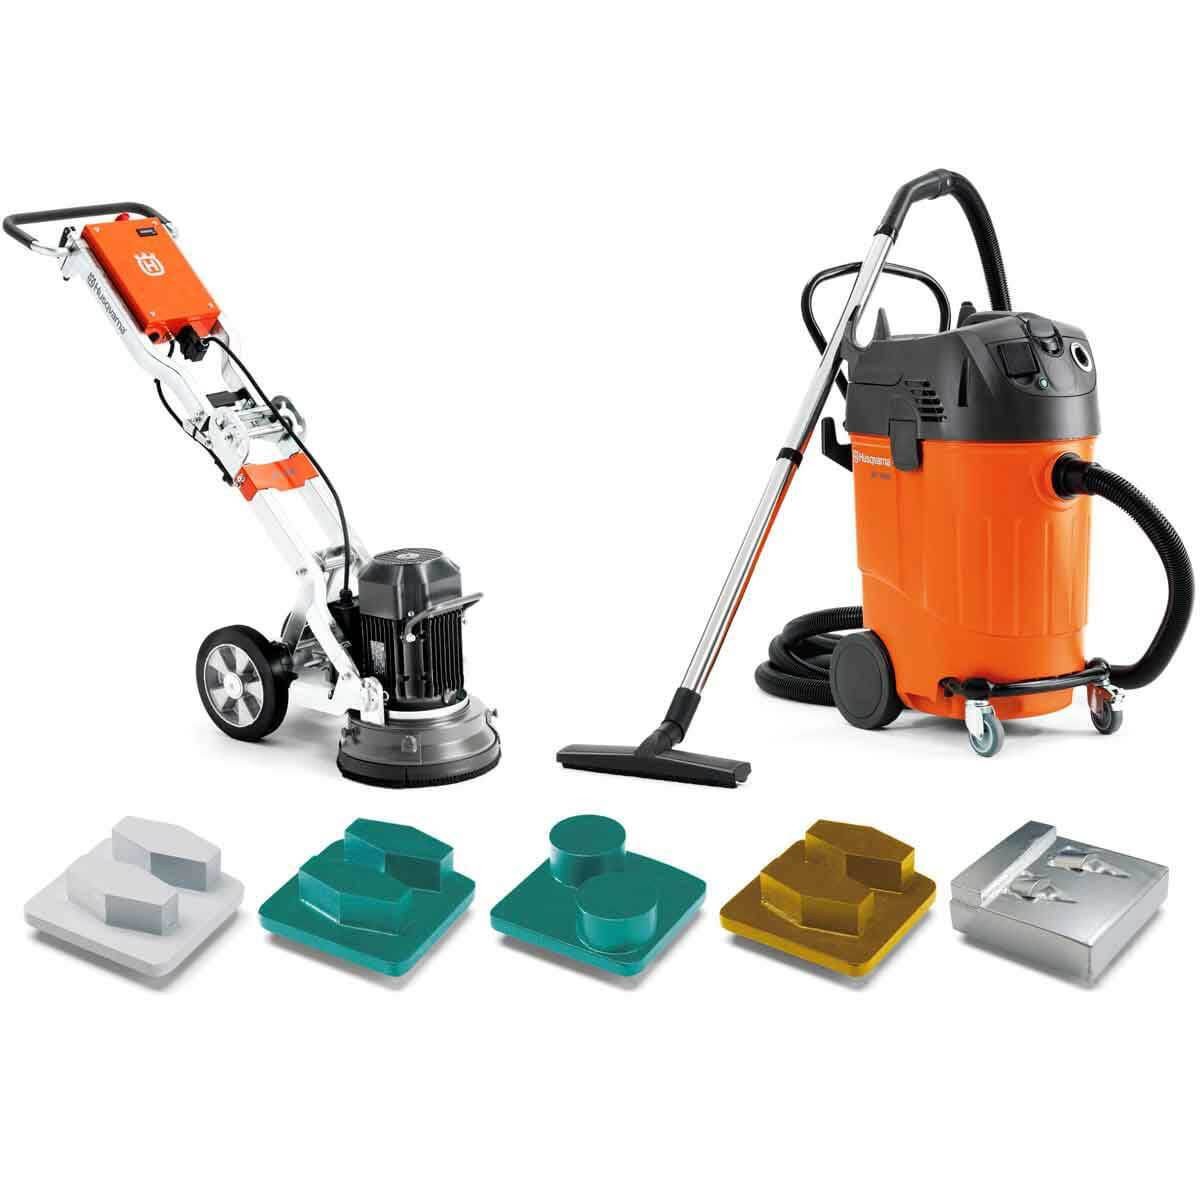 Husqvarna PG 280 Grinder vacuum